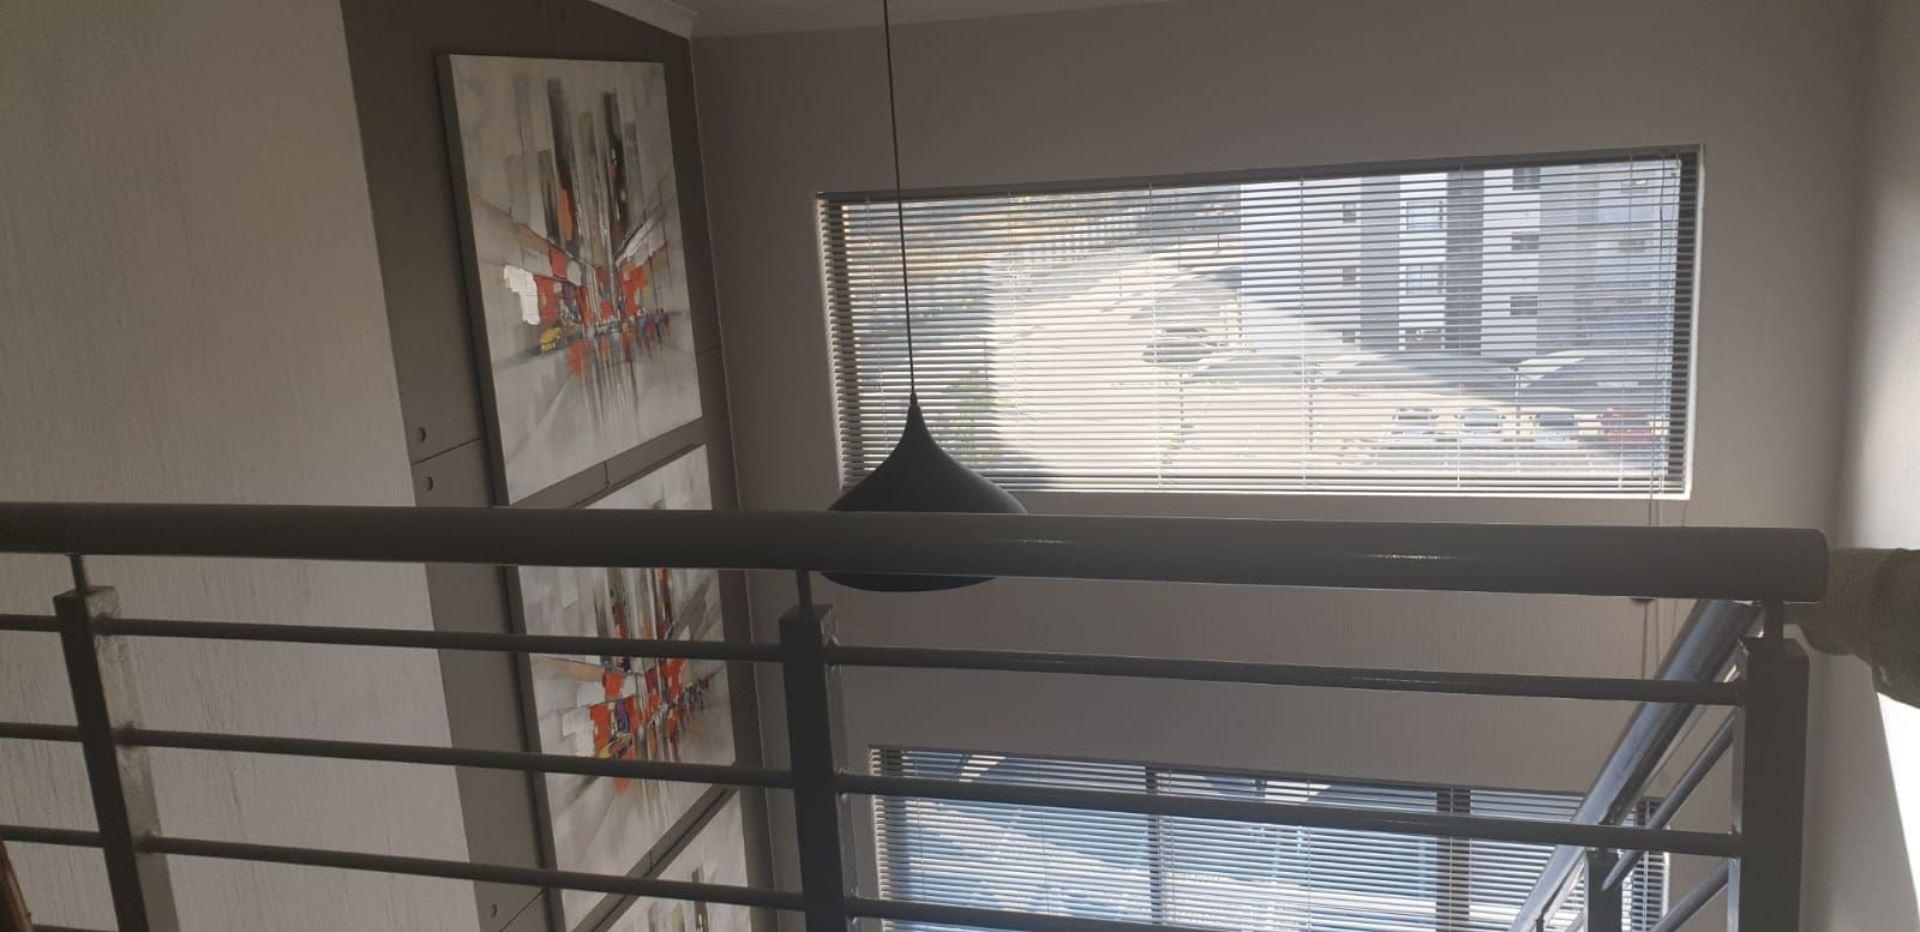 Apartment Rental Monthly in BROADACRES